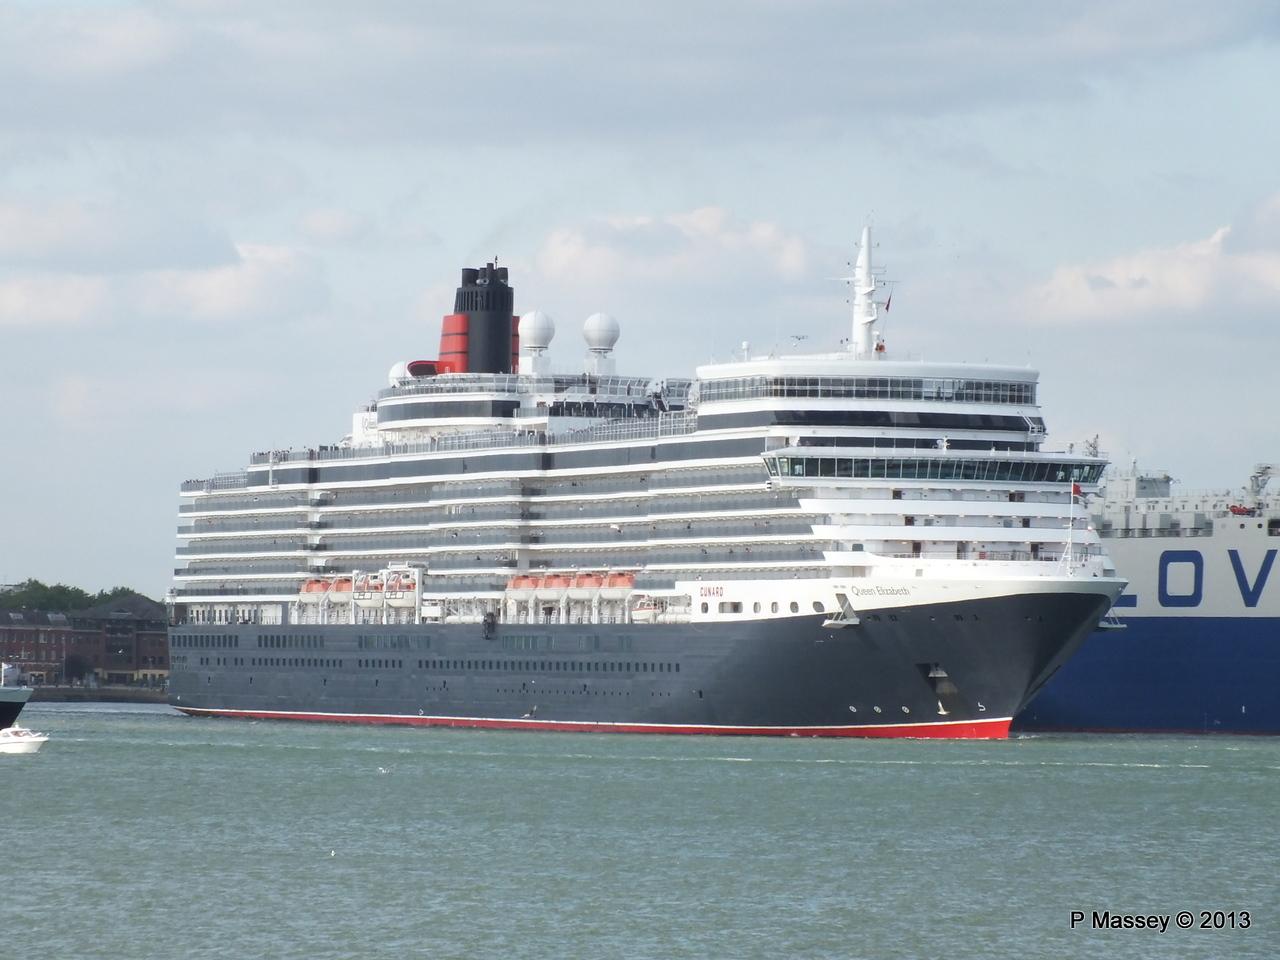 QUEEN ELIZABETH Departing Southampton OCEAN SCENE PDM 10-08-2013 17-48-30